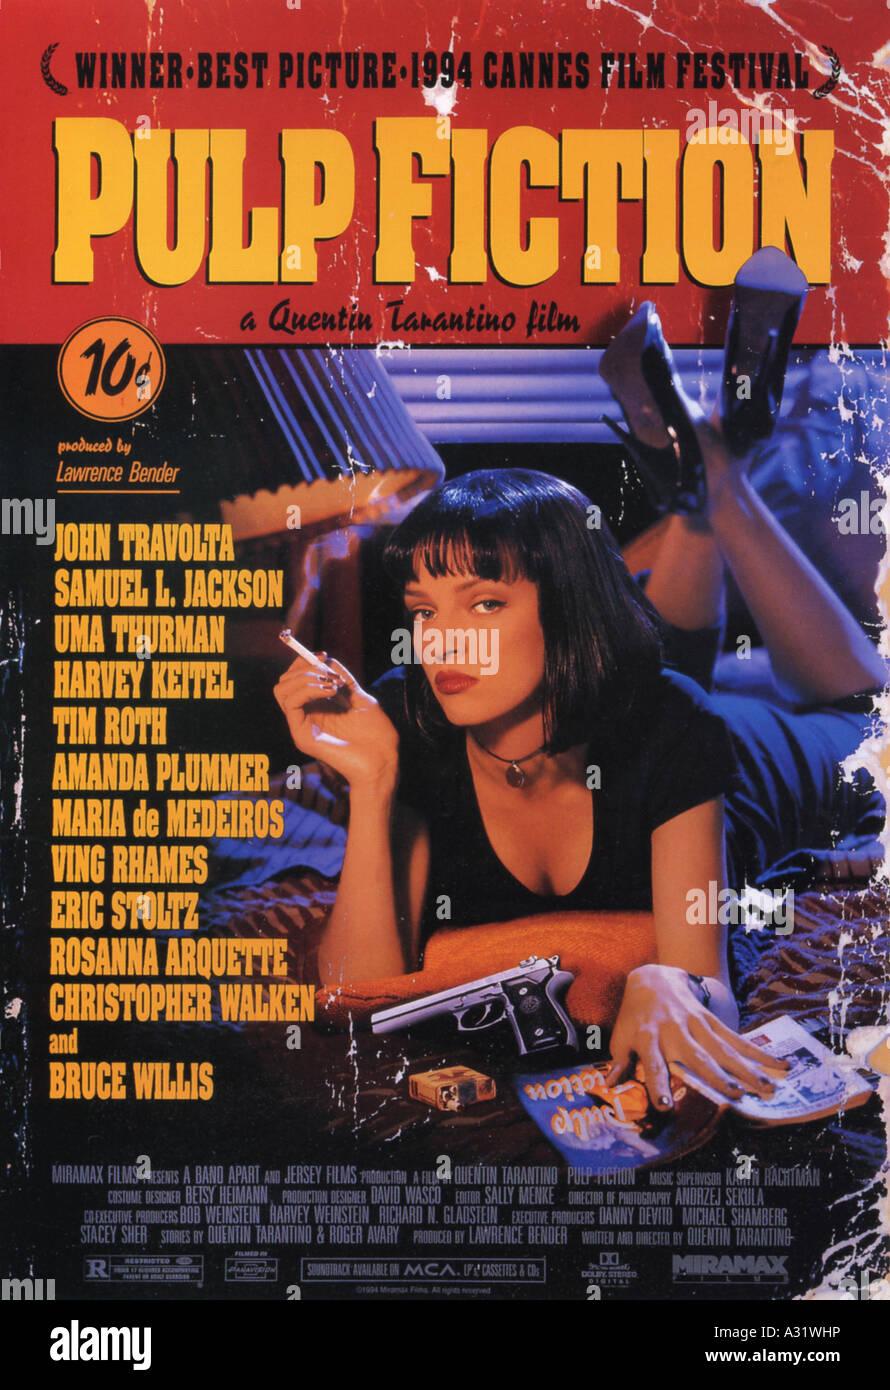 PULP FICTION Poster für das Jahr 1994 Buena Vista/Miramax film mit Uma Thurman, Regie: Quentin Tarantino Stockbild